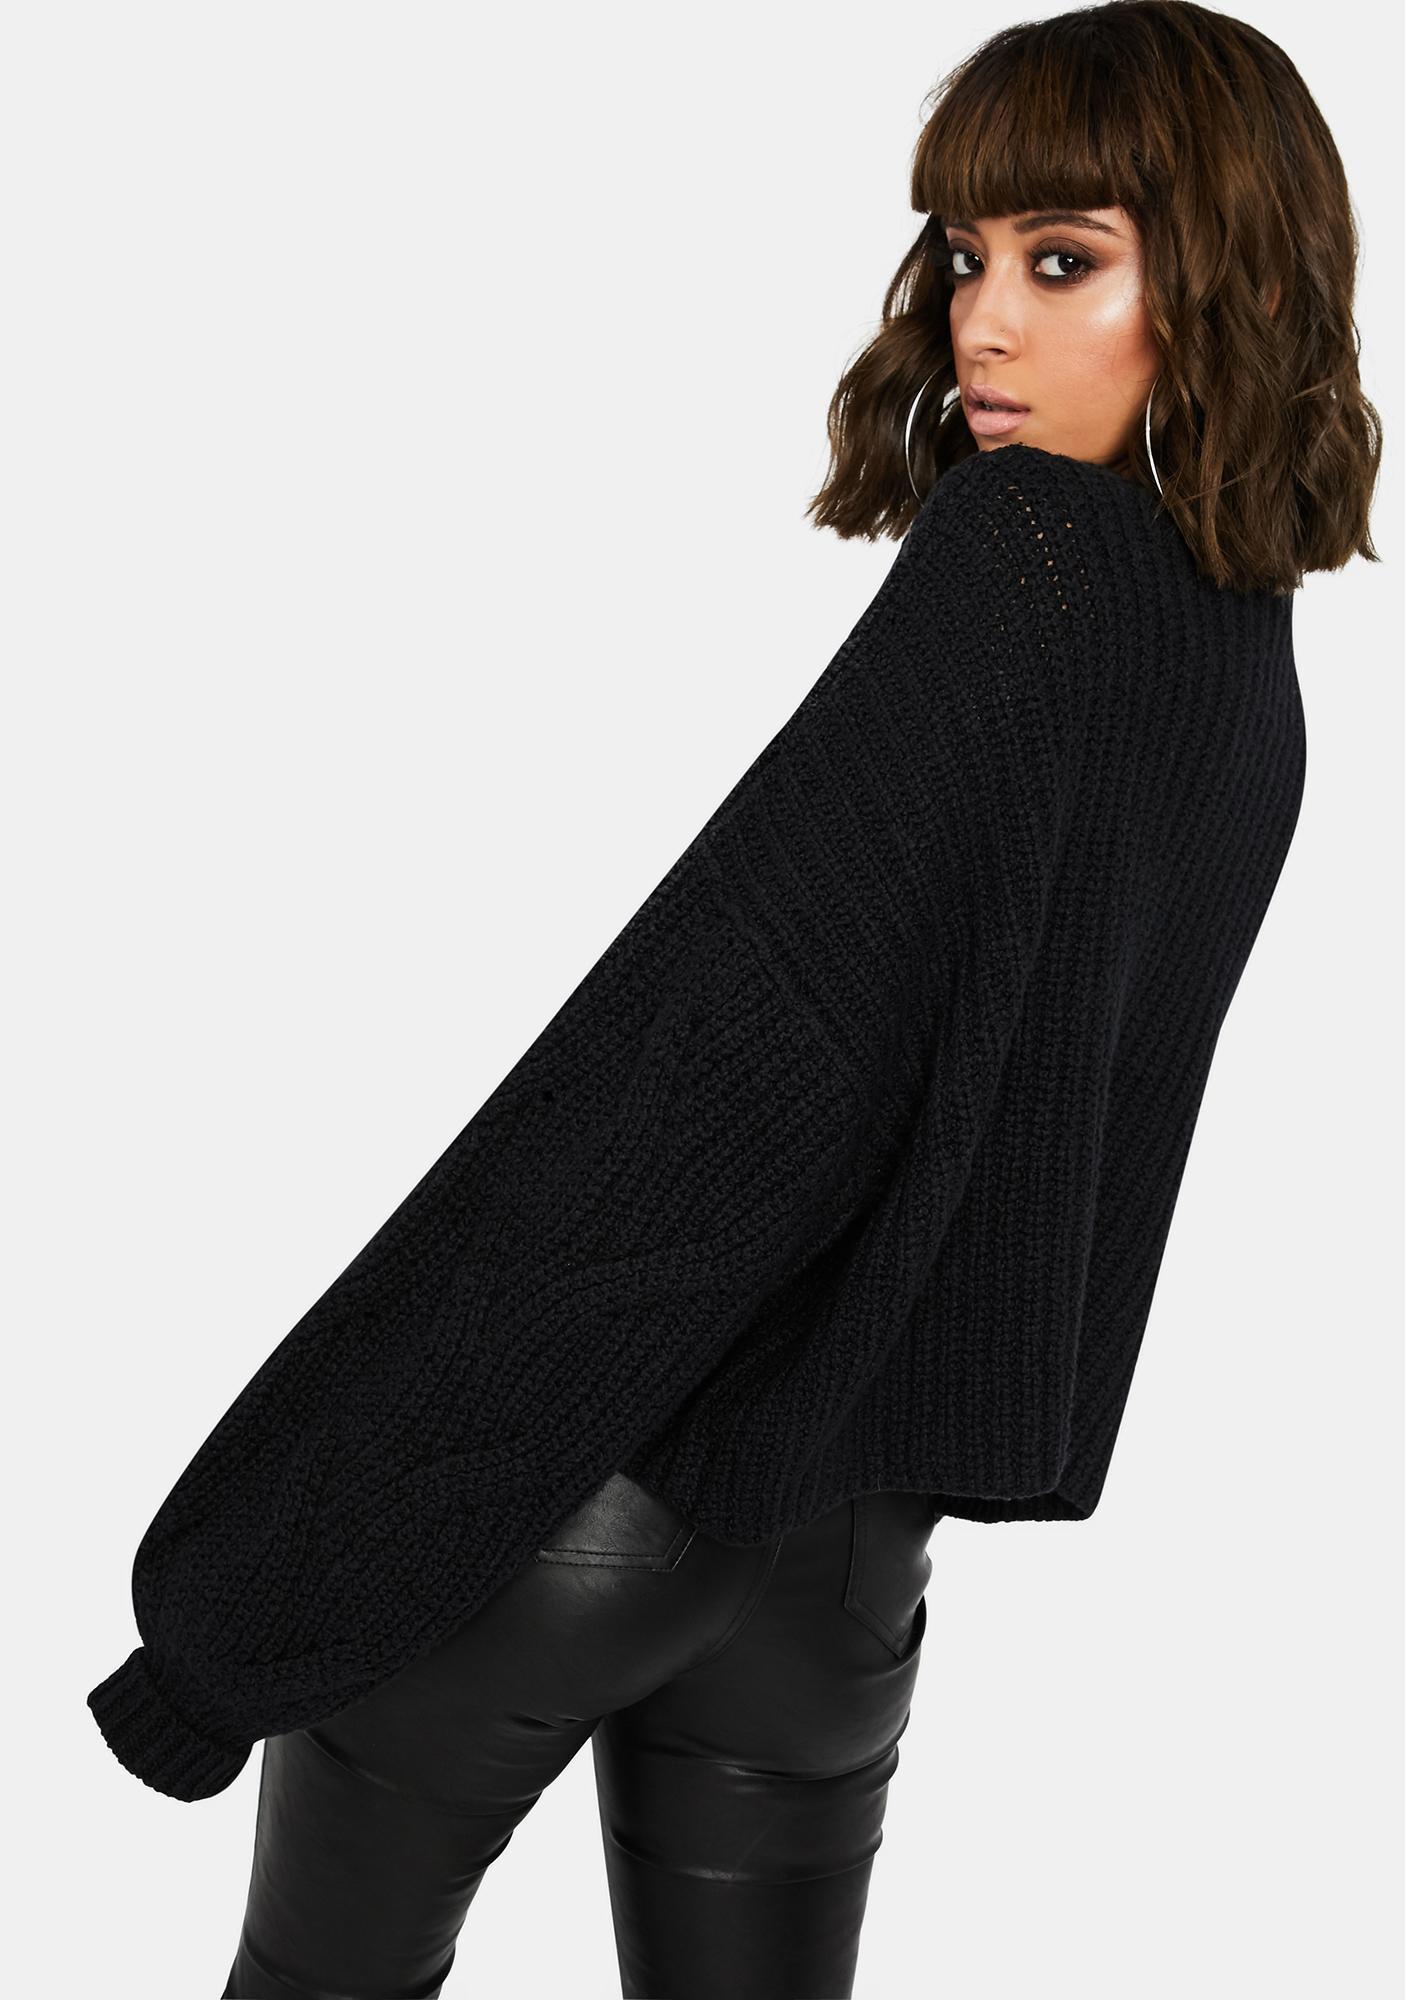 Free People Black Seasons Change Knit Sweater